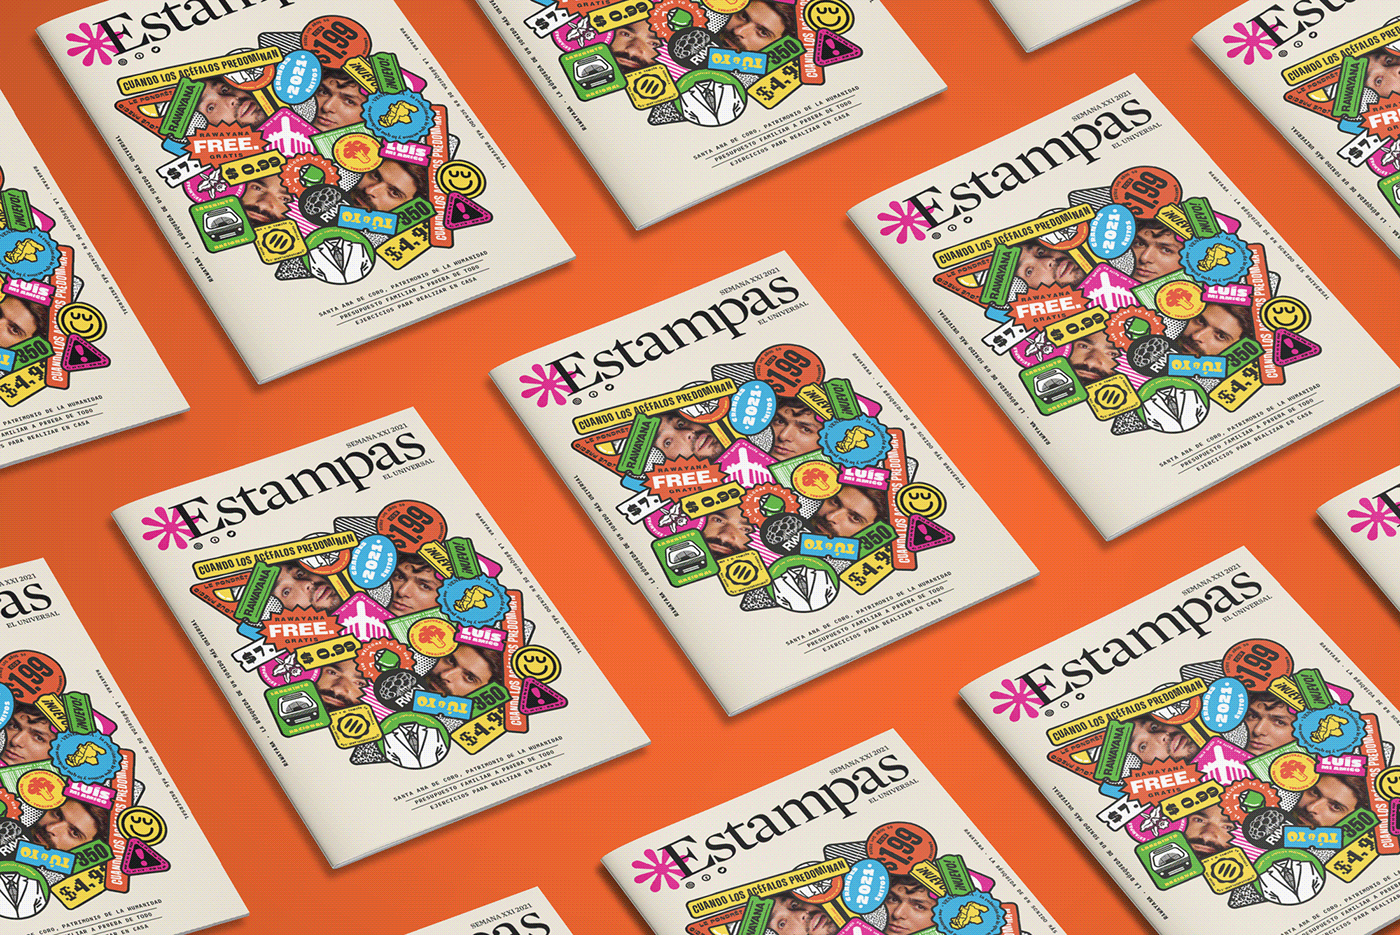 editorial Graphic Designer ilustration iustration magazine Portada de revista rawayana Revista Estampas stickers venezuela